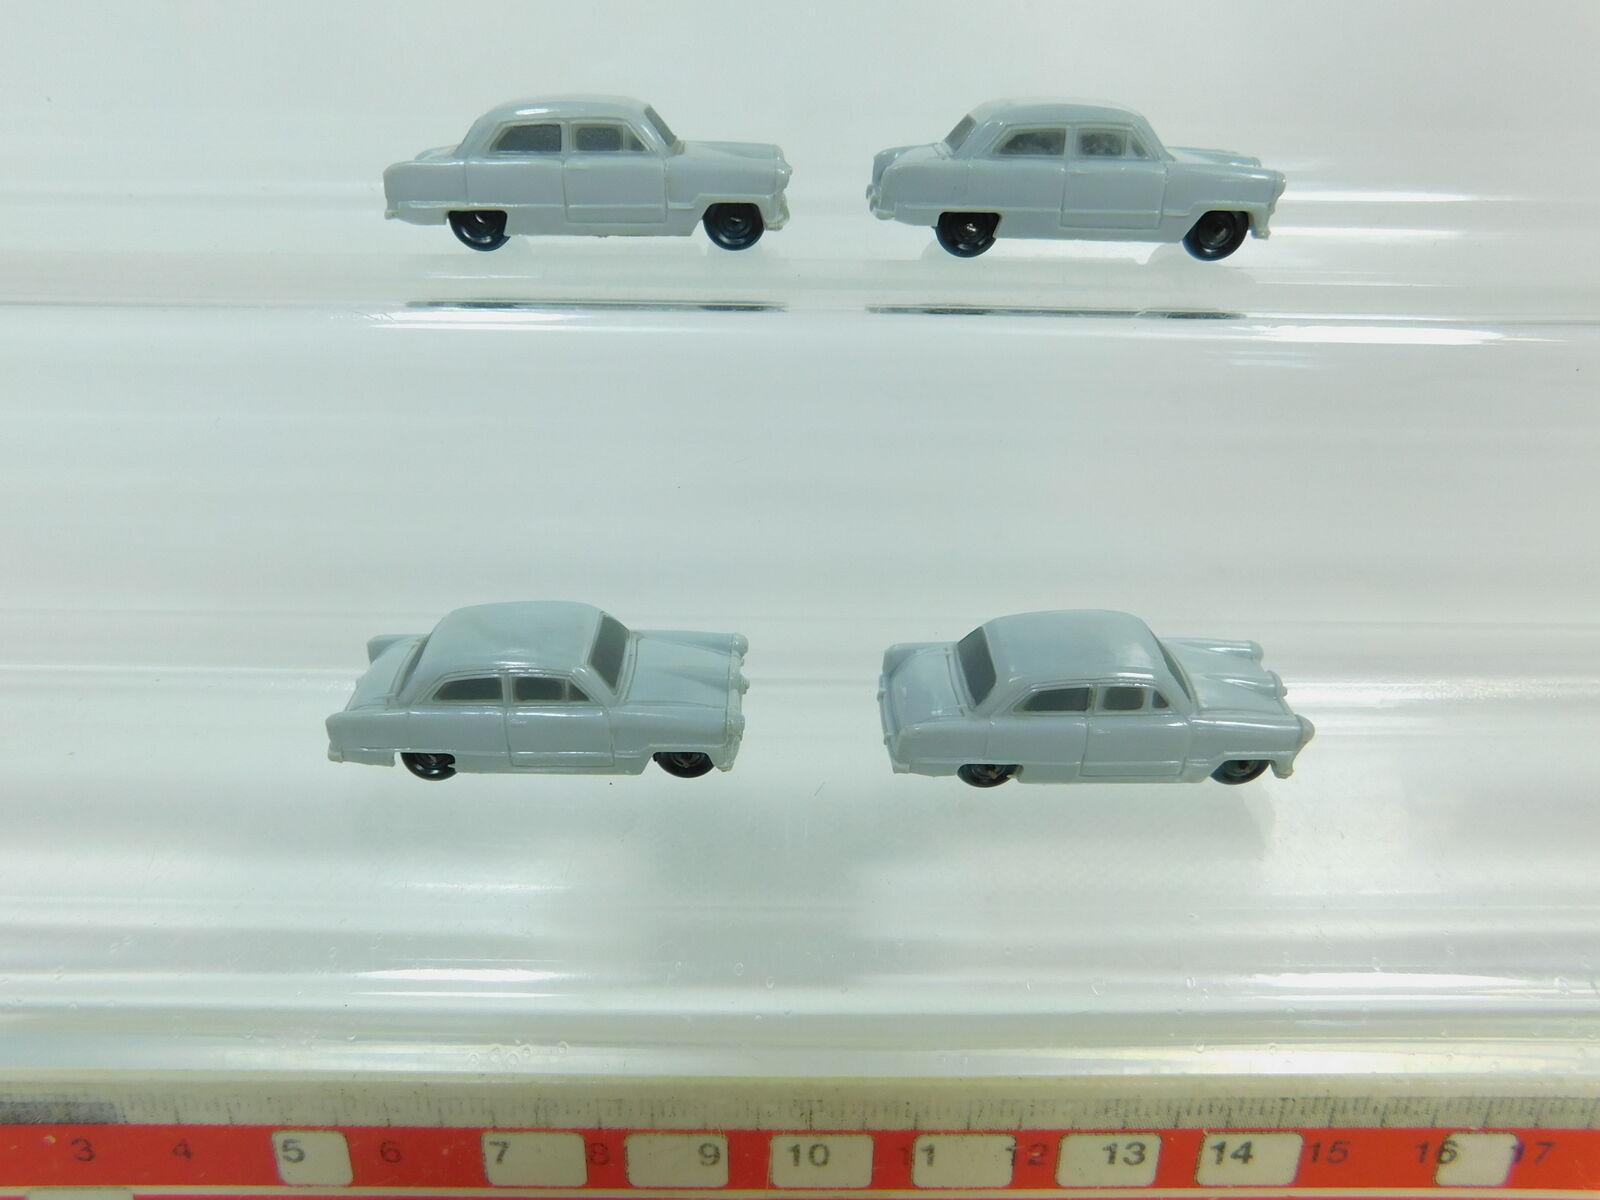 Bp686-0, 5x Märklin h0 CAR FORD TAUNUS 12 M for 4613 Car Transport Wagon, S.G.